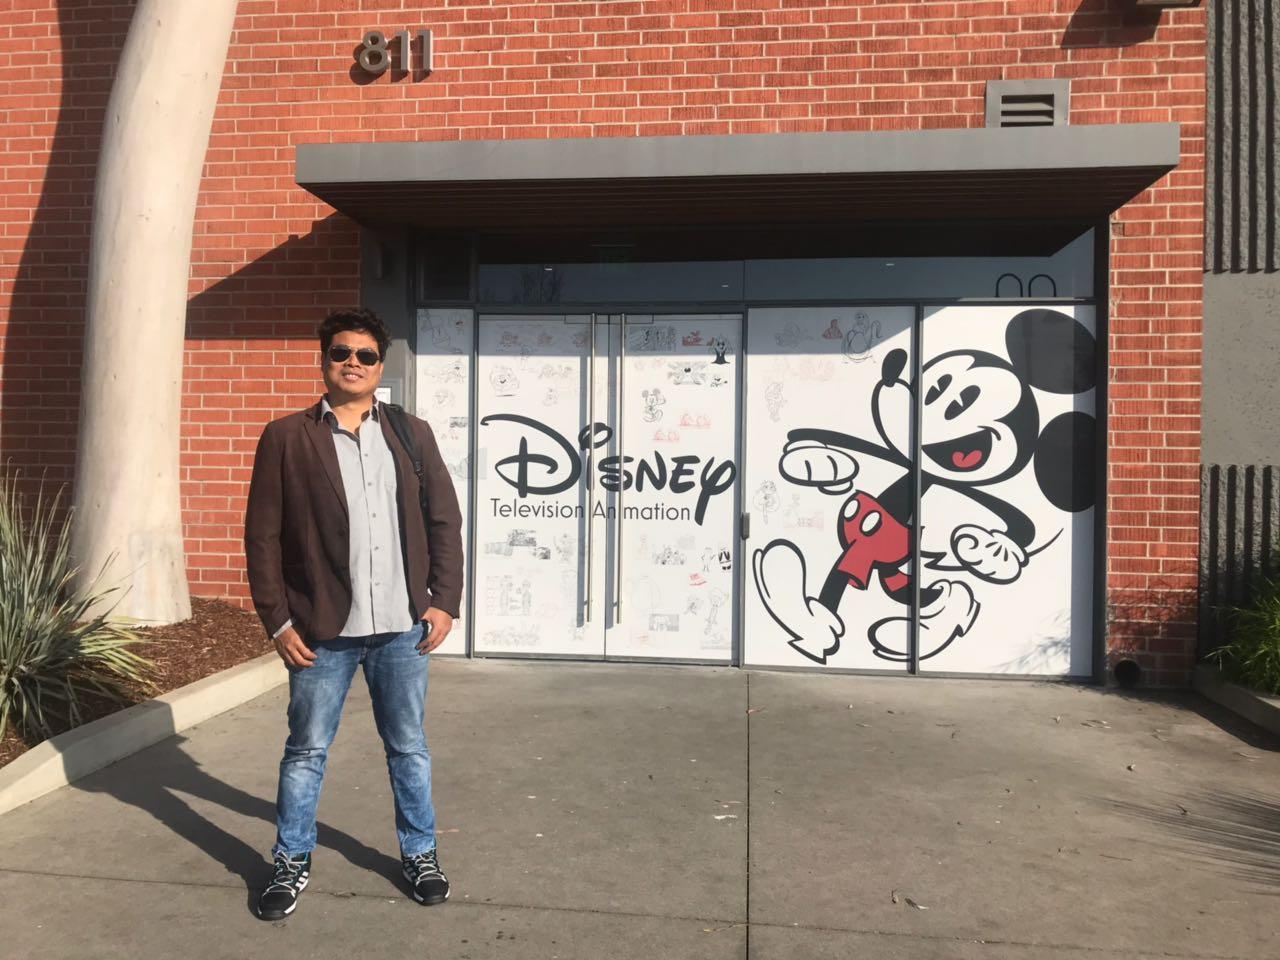 Disney Television Animation, Glendale